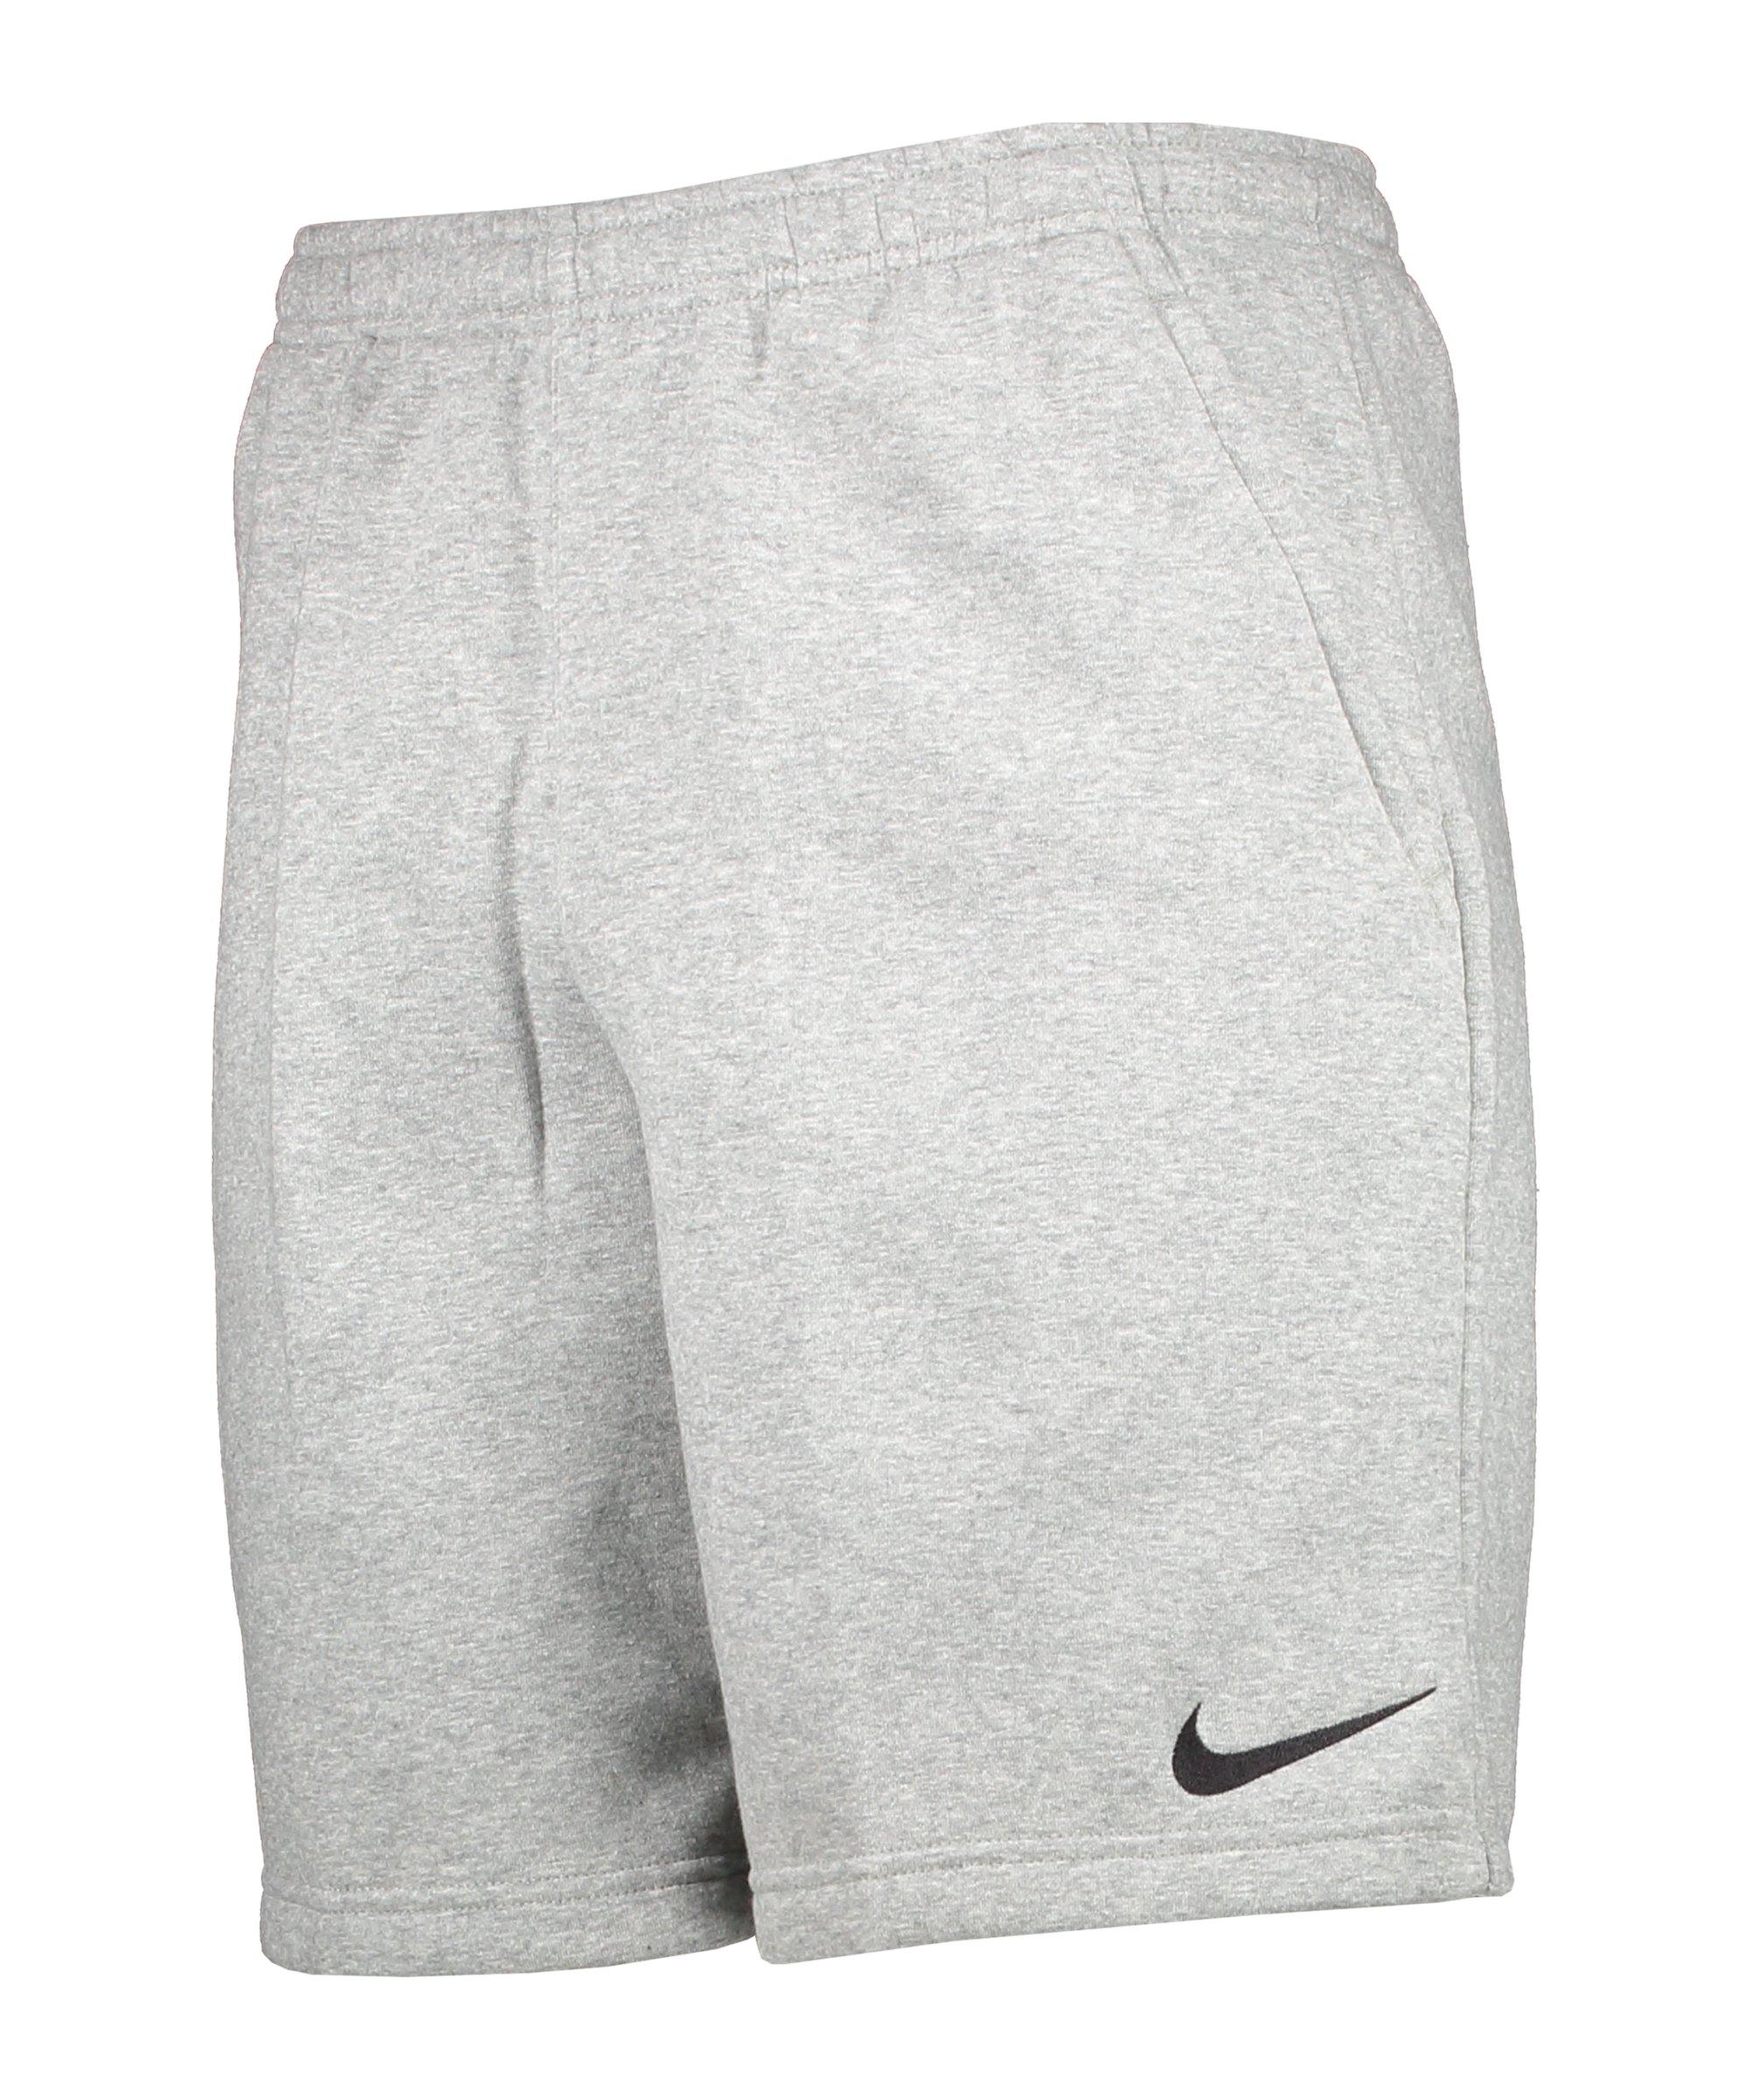 Nike Park 20 Fleece Short Grau Schwarz F063 - grau